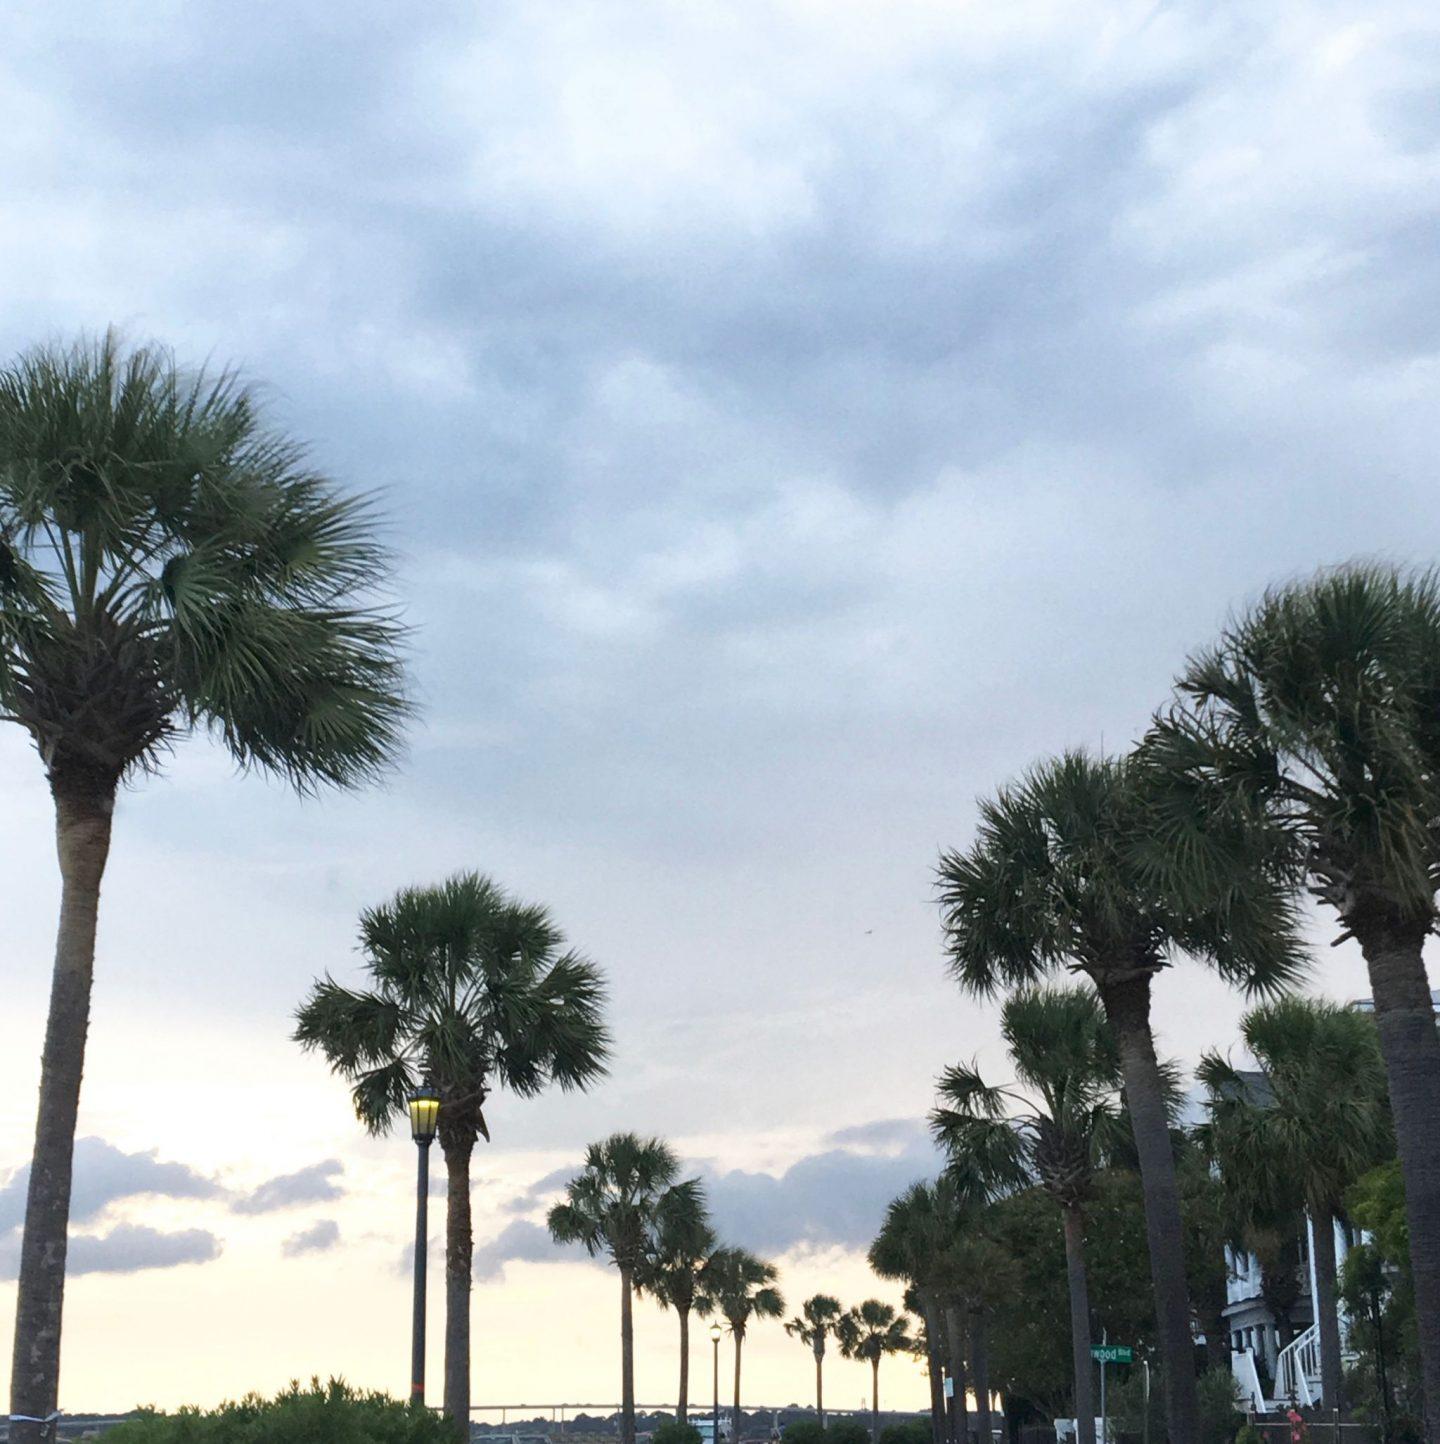 charleston travel guide, charleston sunset, palm trees of charleston